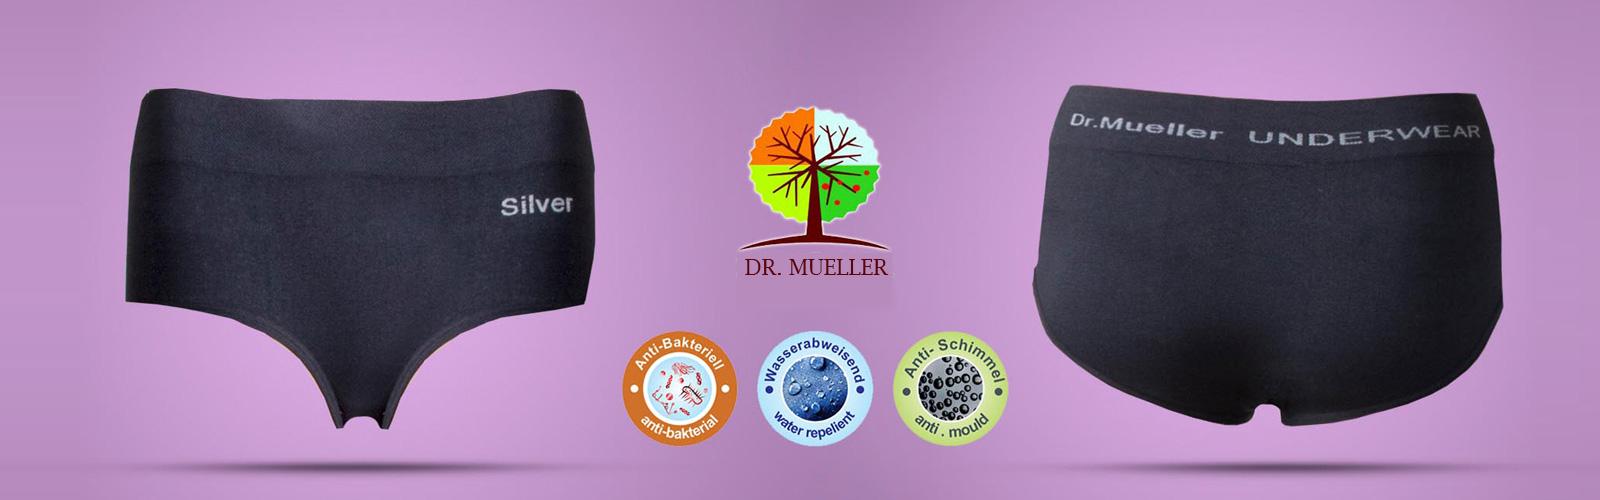 dr.-mueller-banner-1